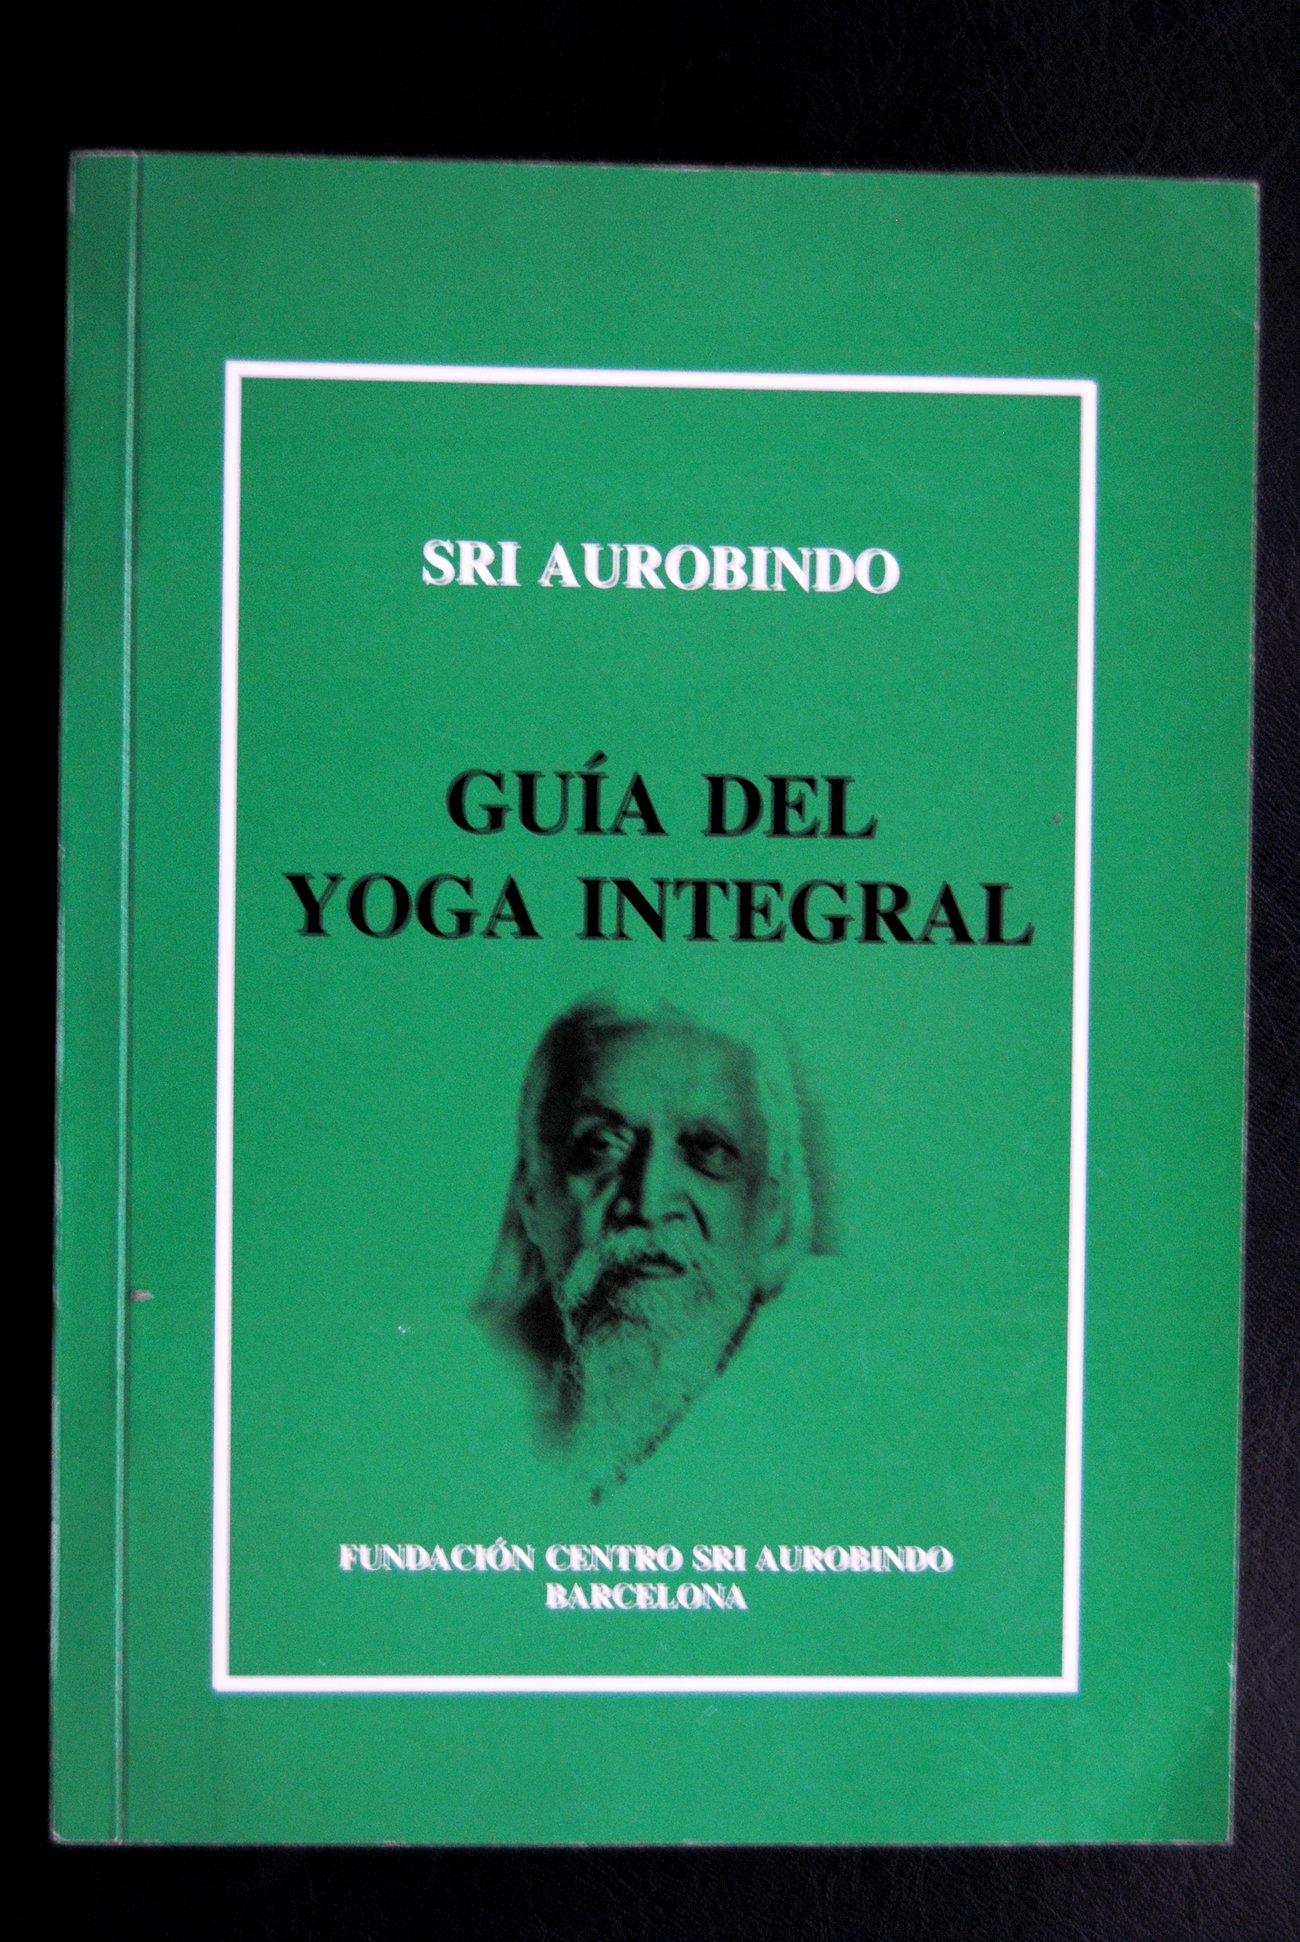 Guia del yoga integral: Amazon.es: Aurobindo Sri: Libros